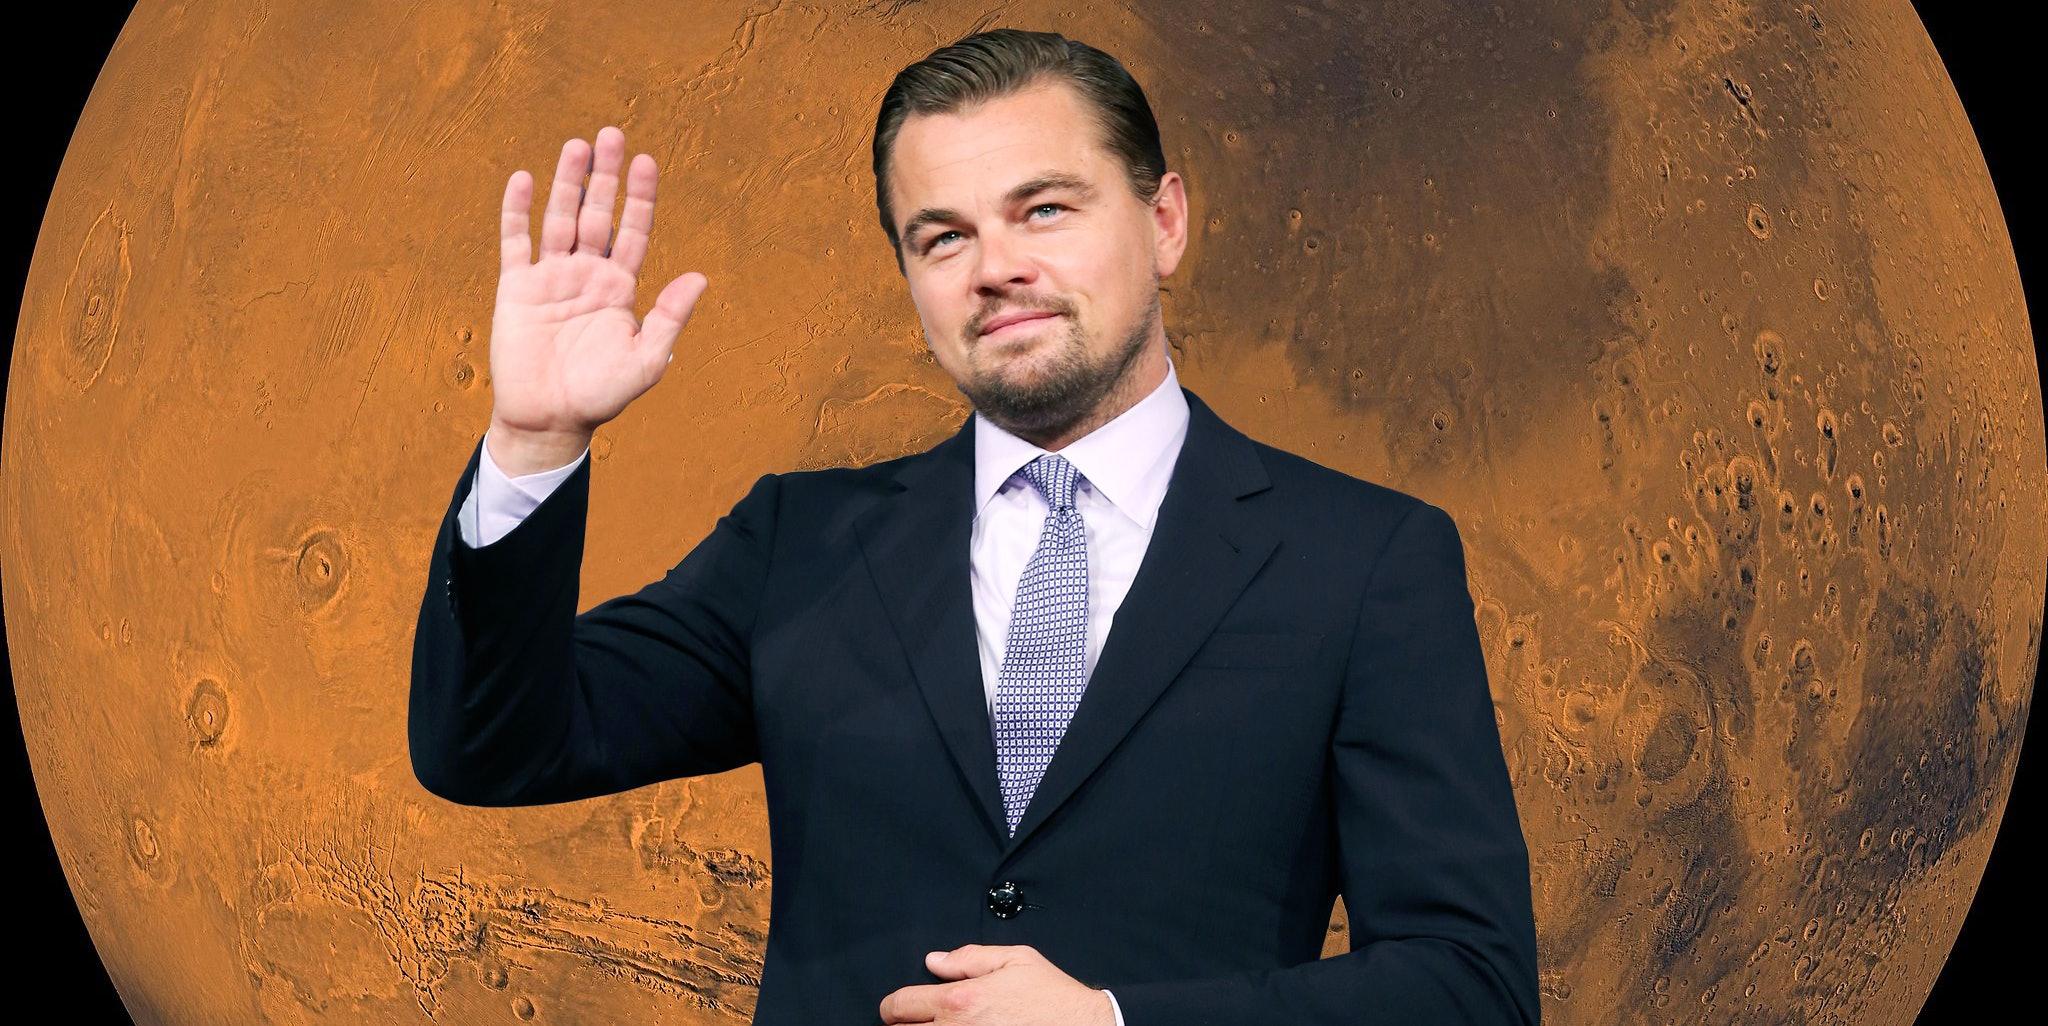 Leonardo DiCaprio said he's going to Mars.